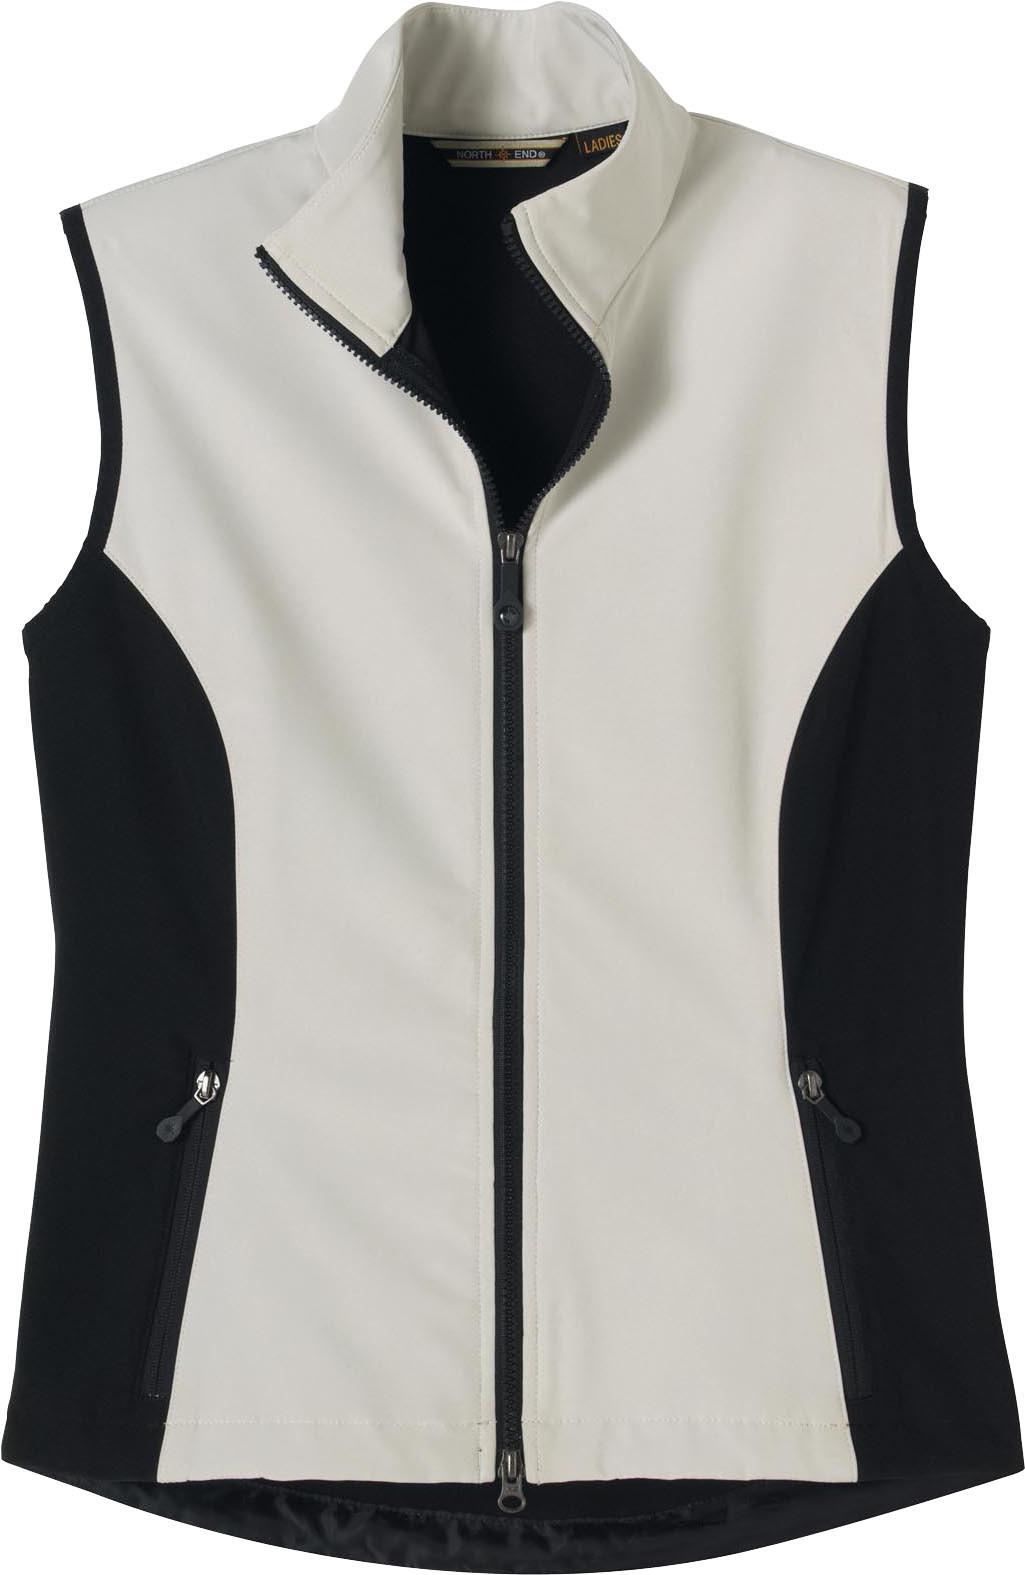 Ash City Soft Shells 78050 - Ladies' Soft Shell Performance Vest